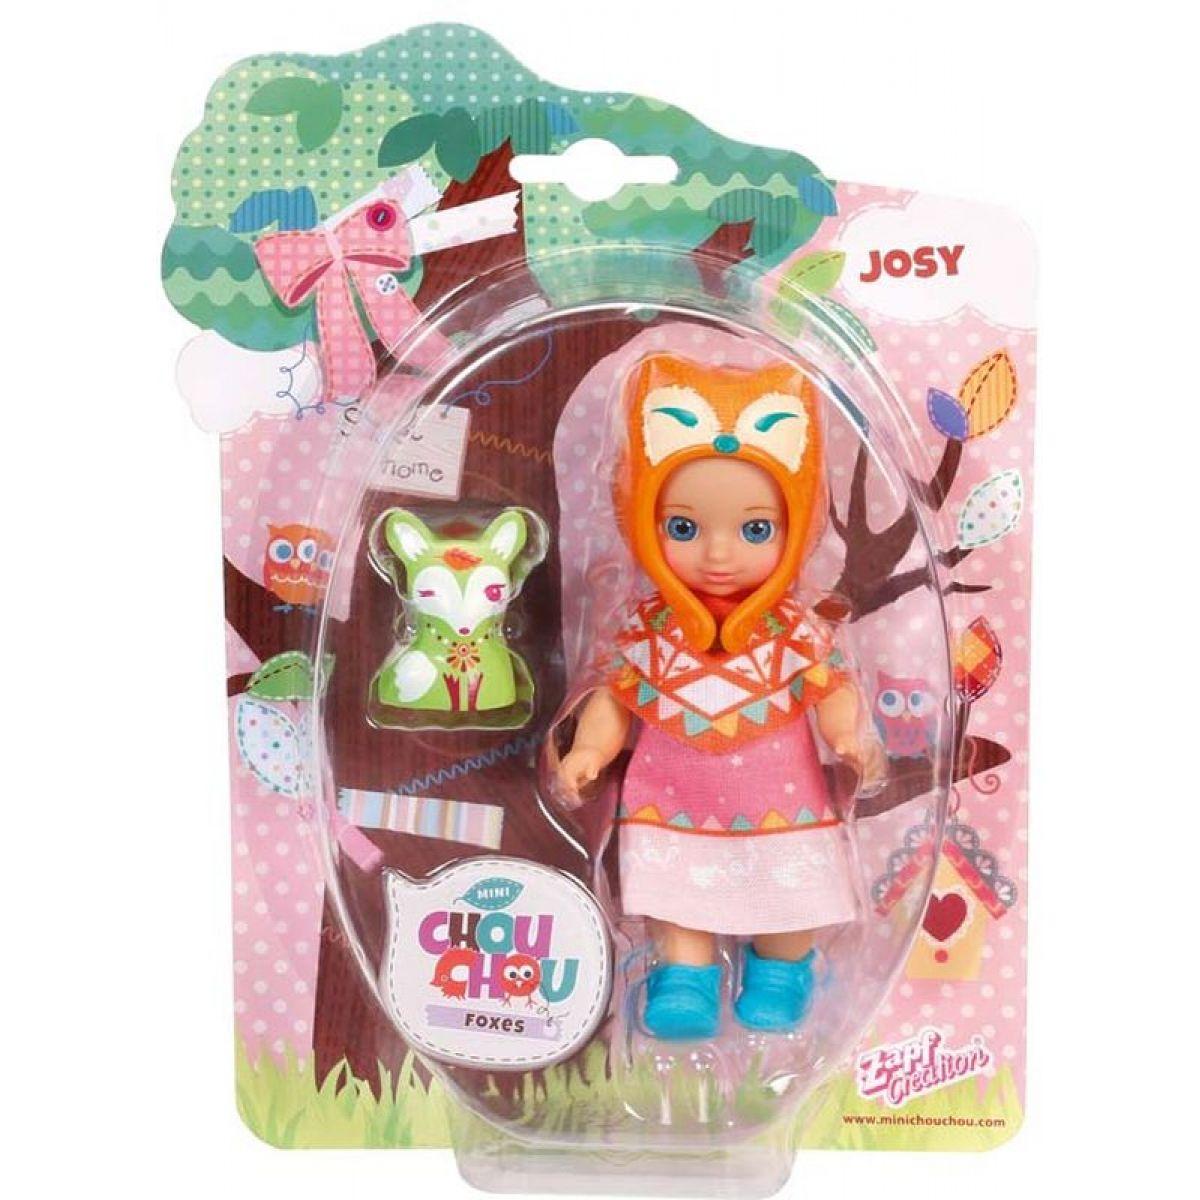 Mini Chou Chou Lištička - Josy #2